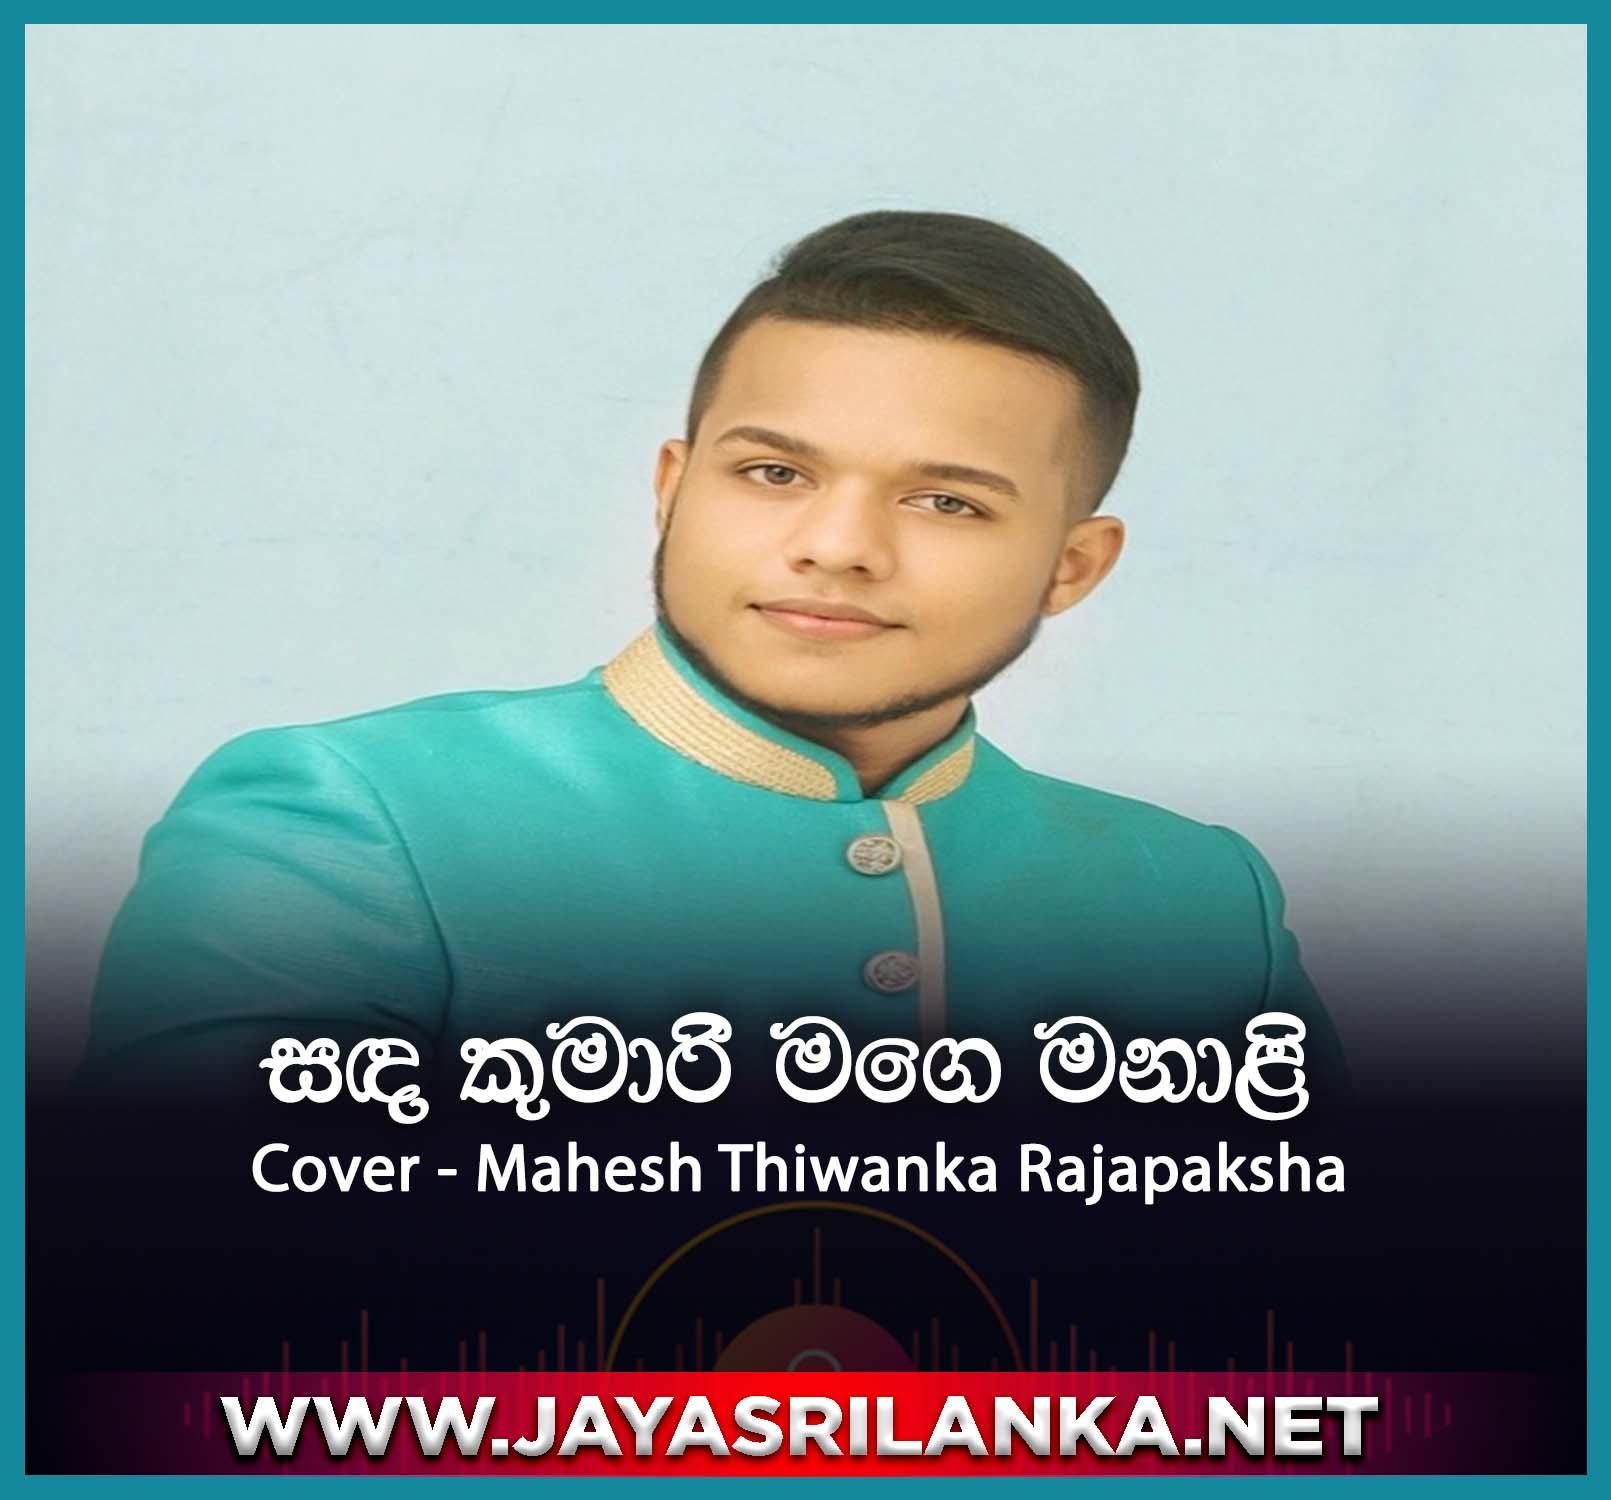 Sanda Kumari Mage Manali Cover